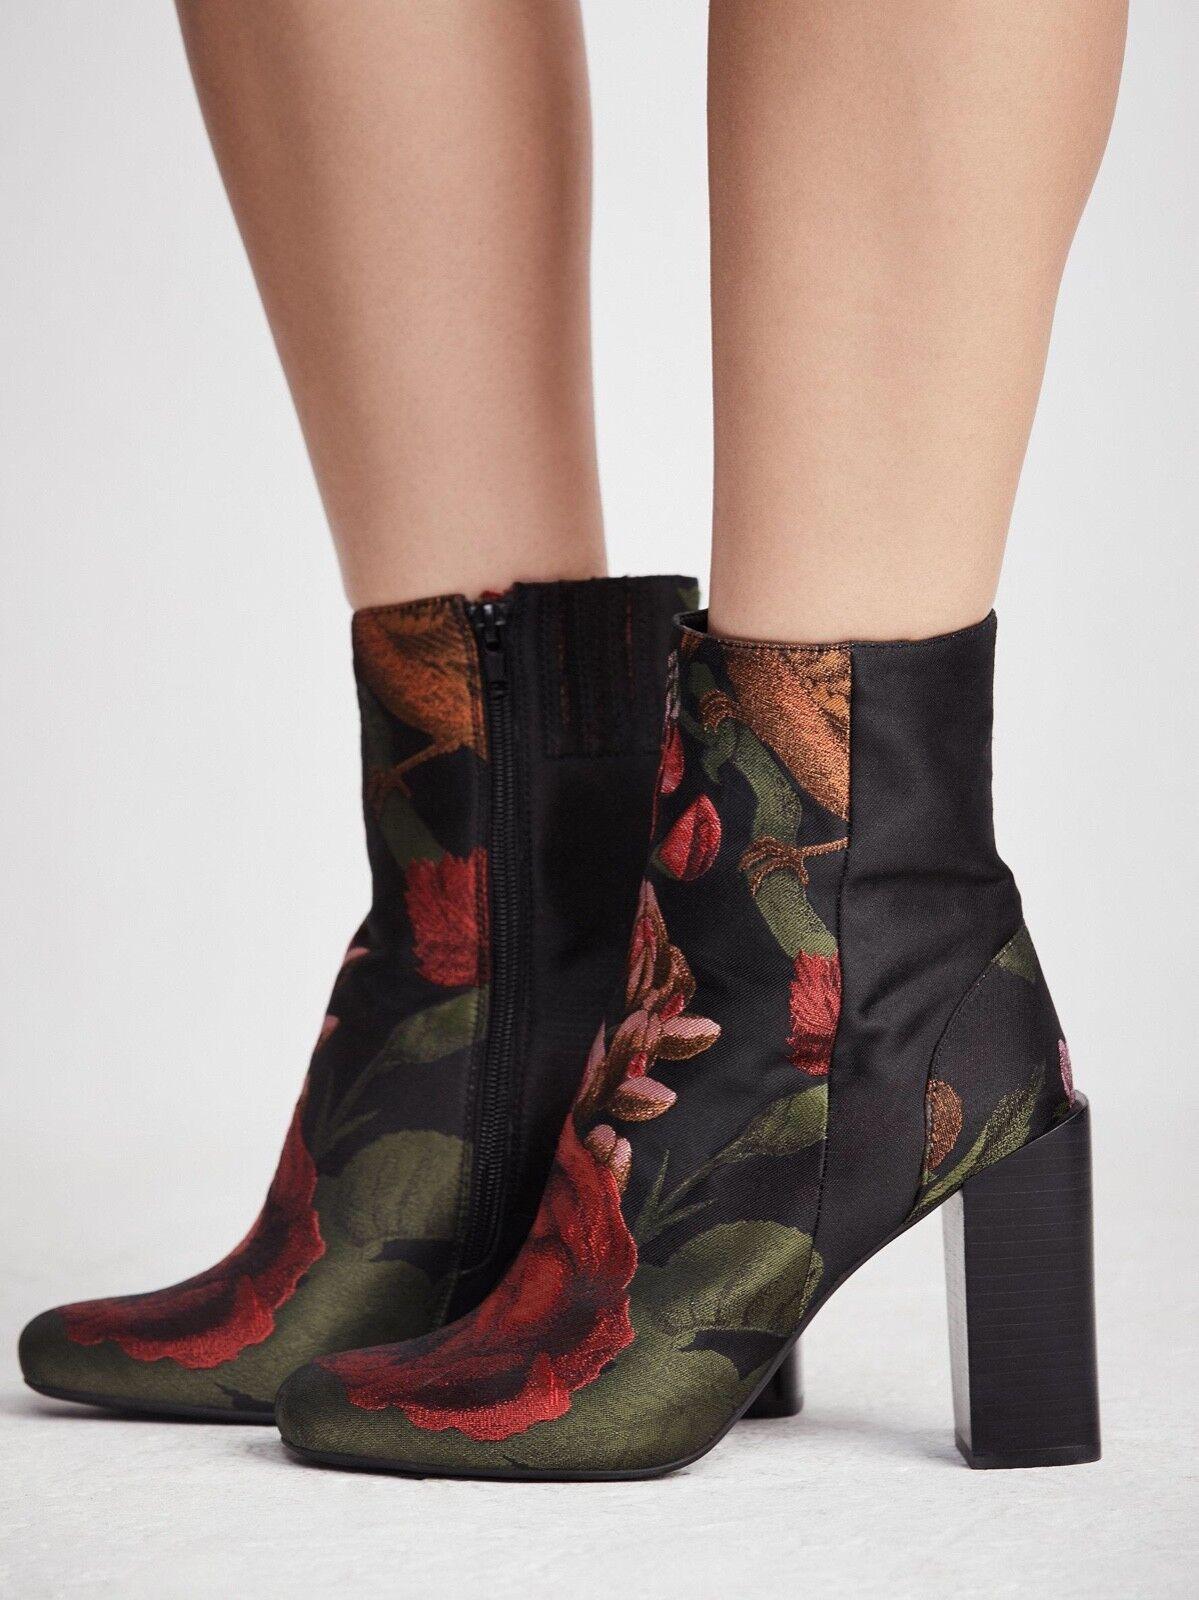 JEFFREY CAMPBELL STRATFORD damen's High Ankle Stiefel Floral Brocade 8M